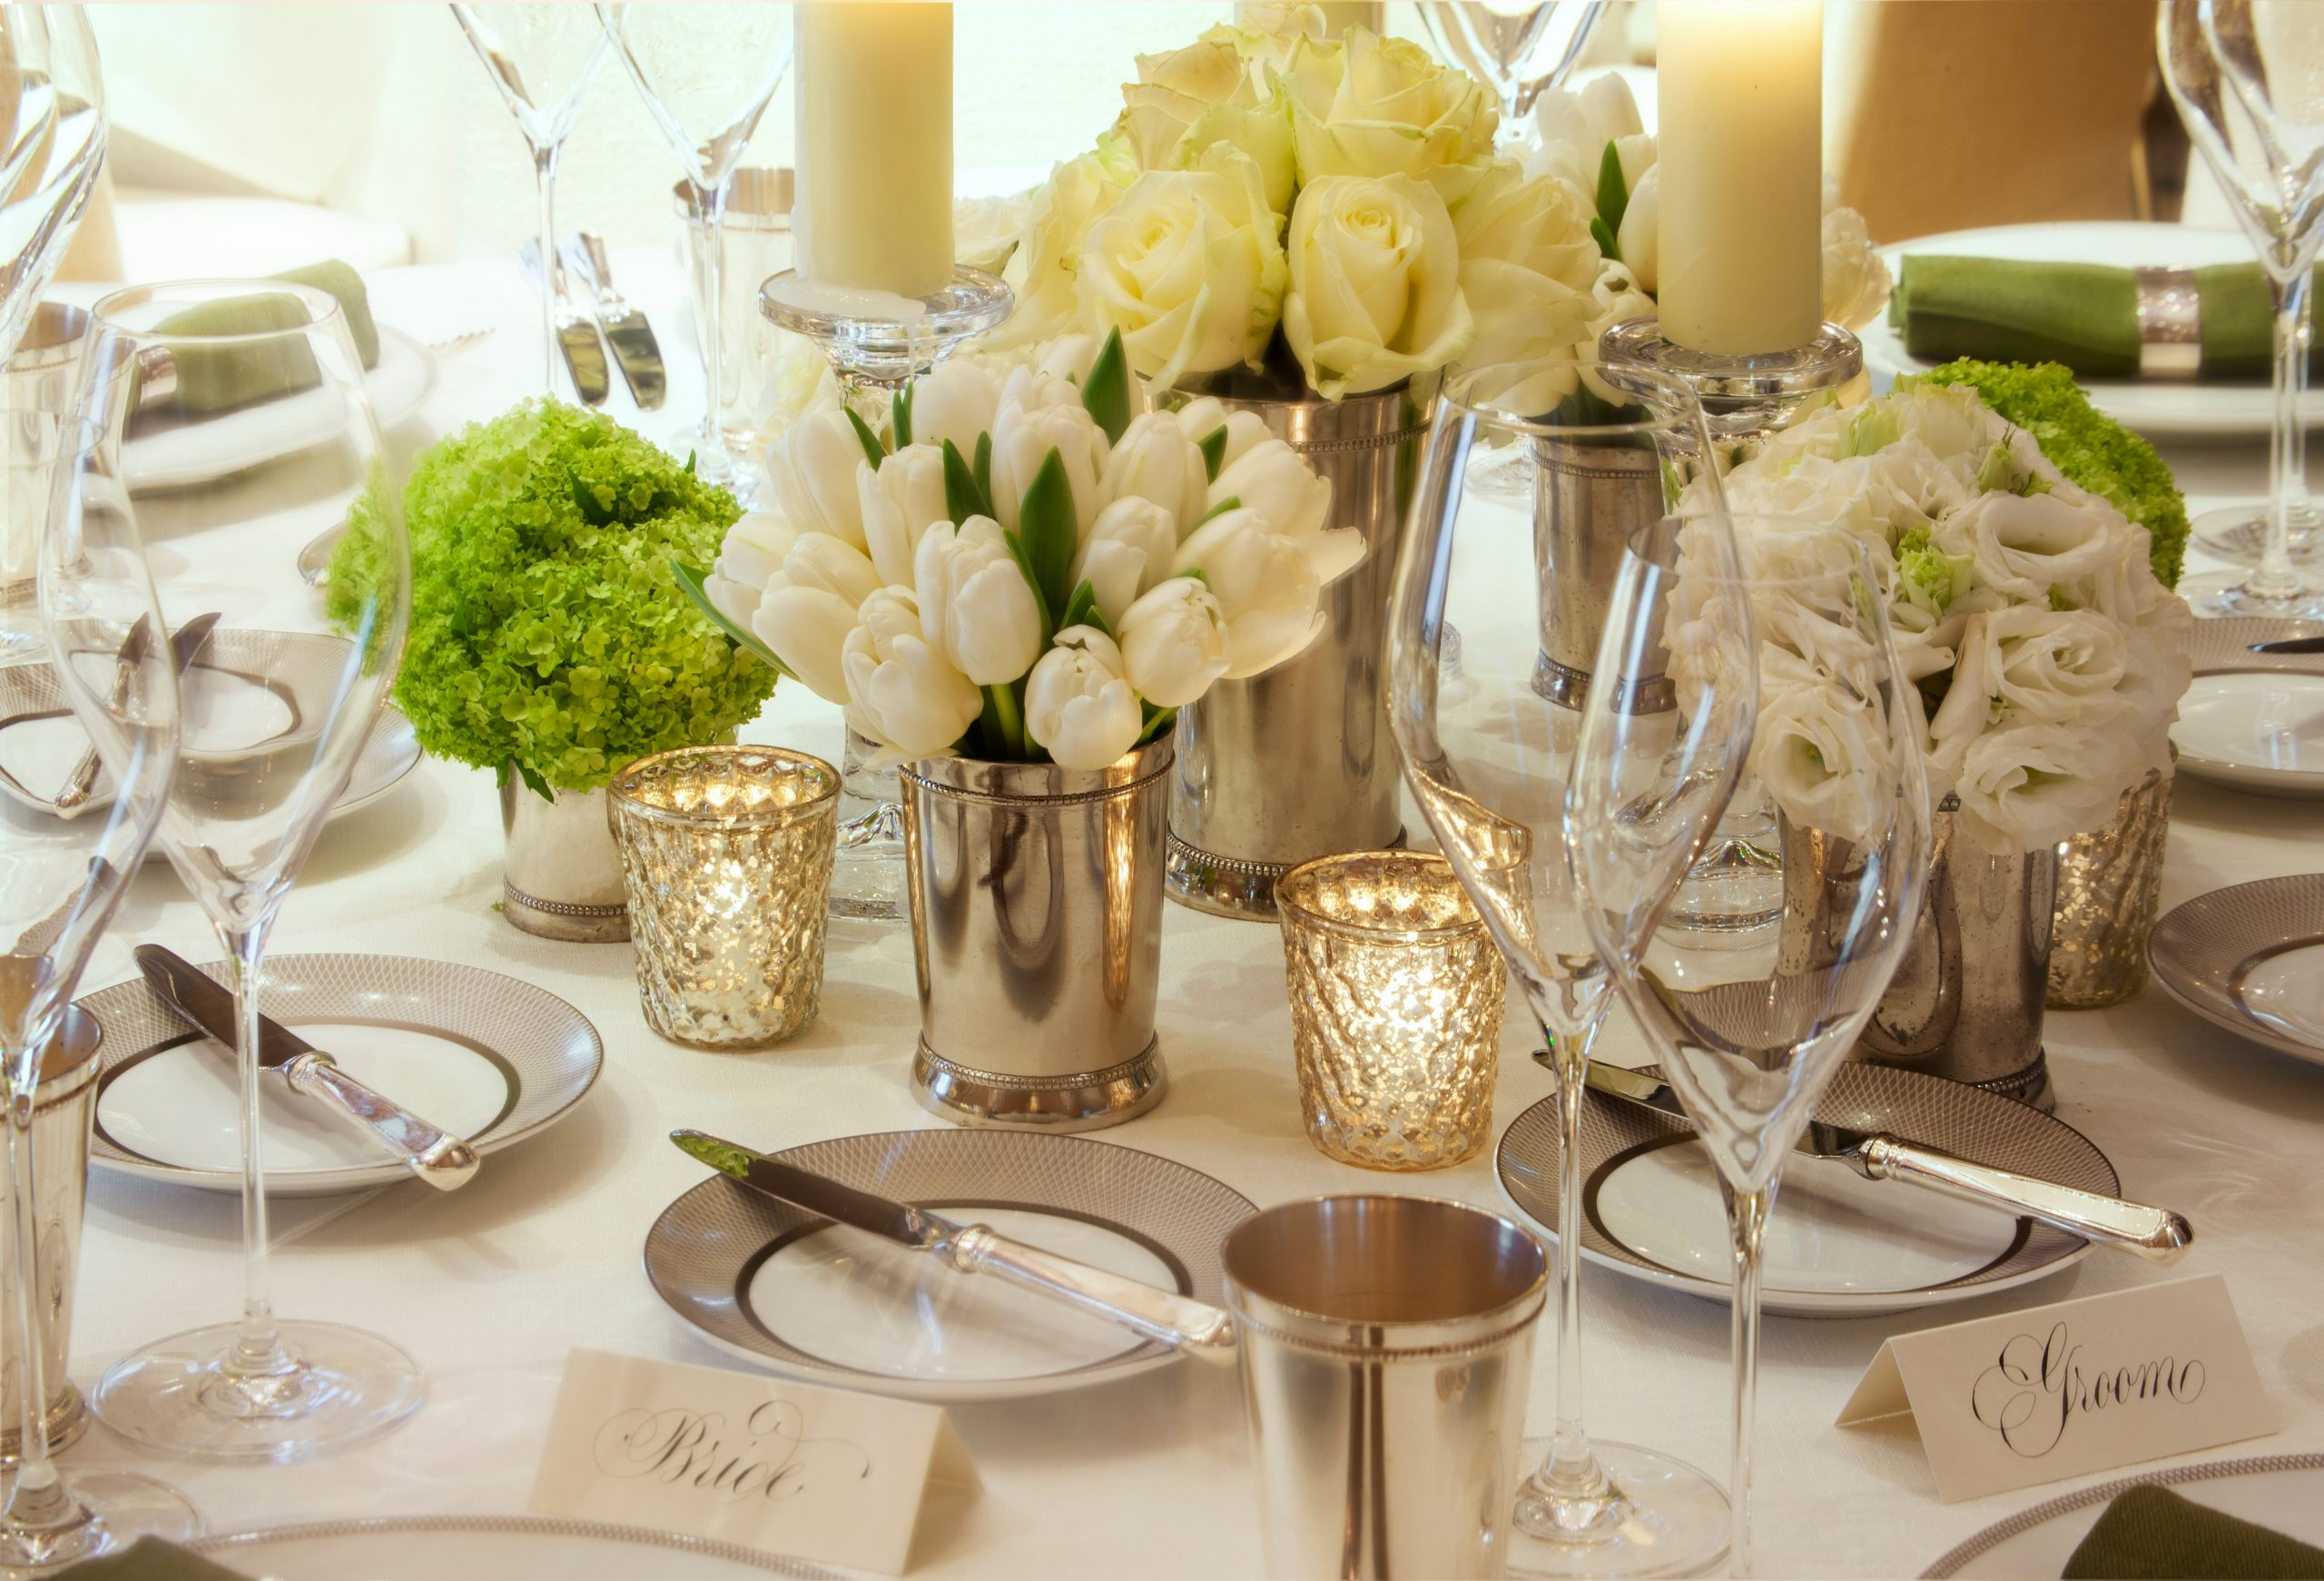 Weddings at Rosewood London